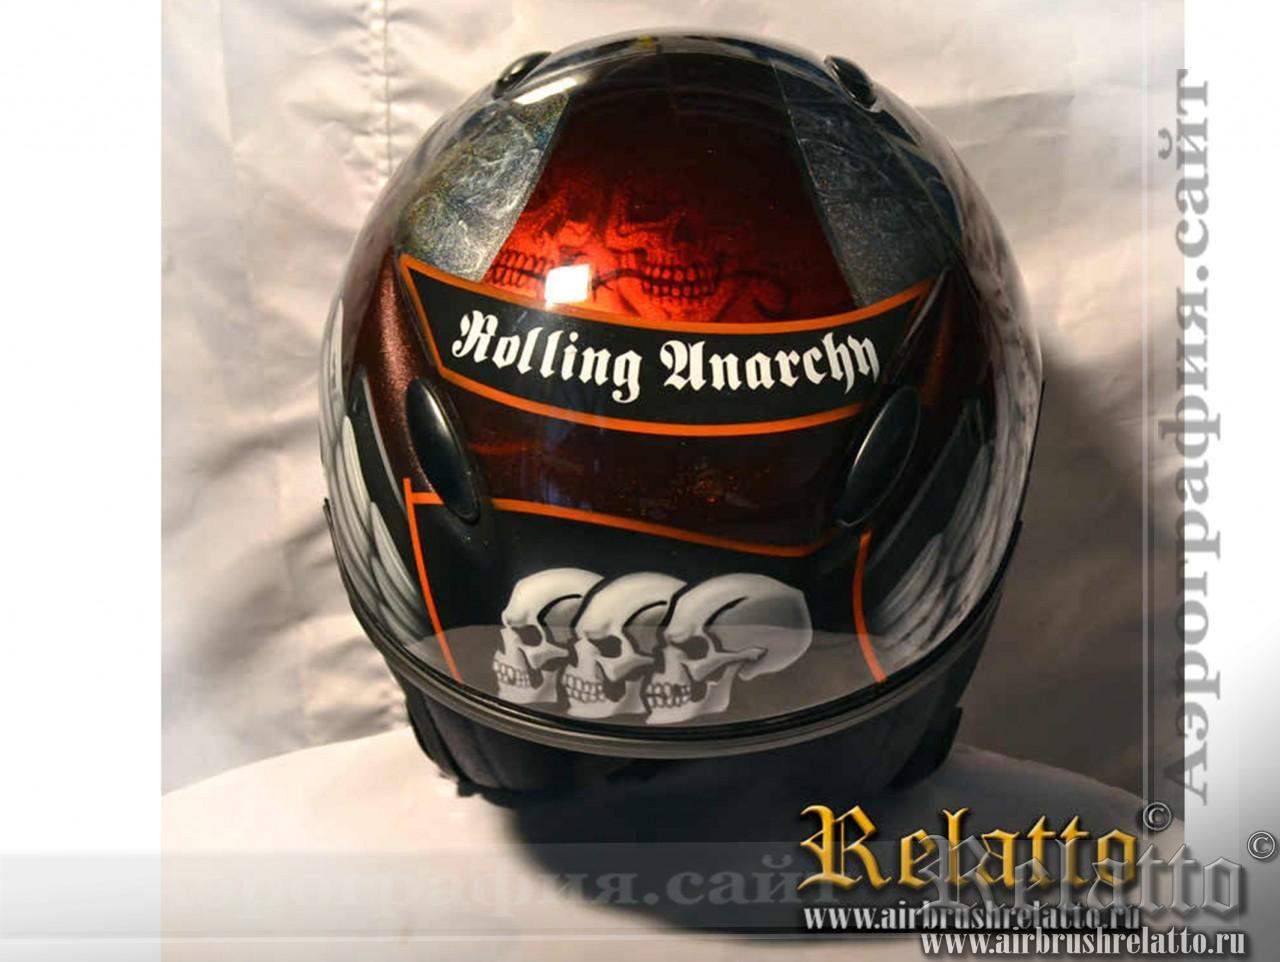 Аэрография на шлеме Rolling Anarchy